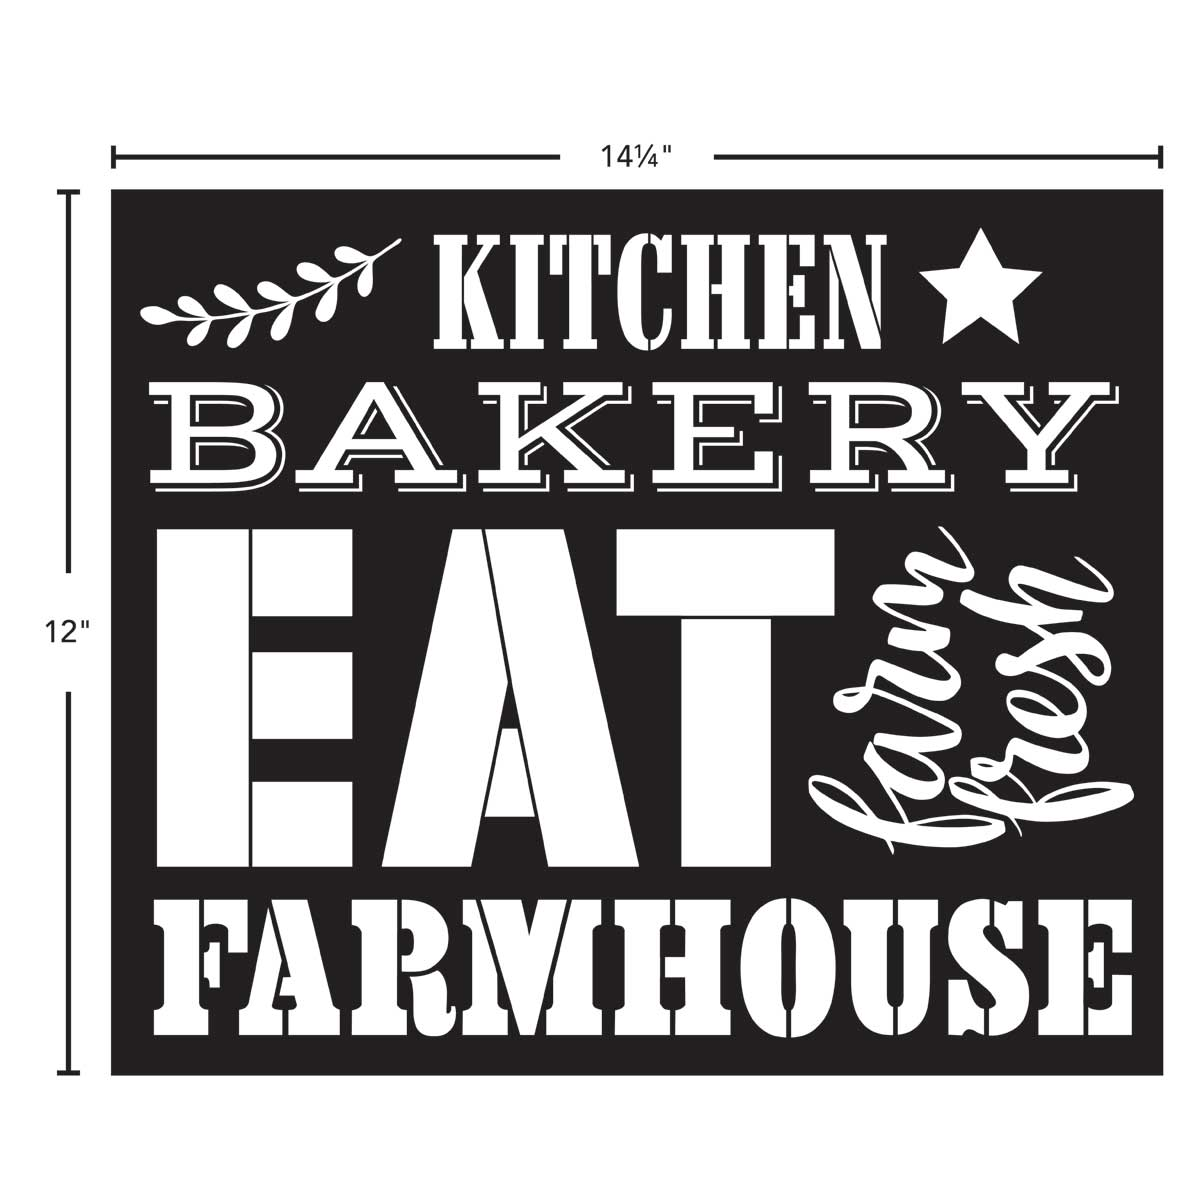 FolkArt ® Painting Stencils - Sign Making - Farmhouse